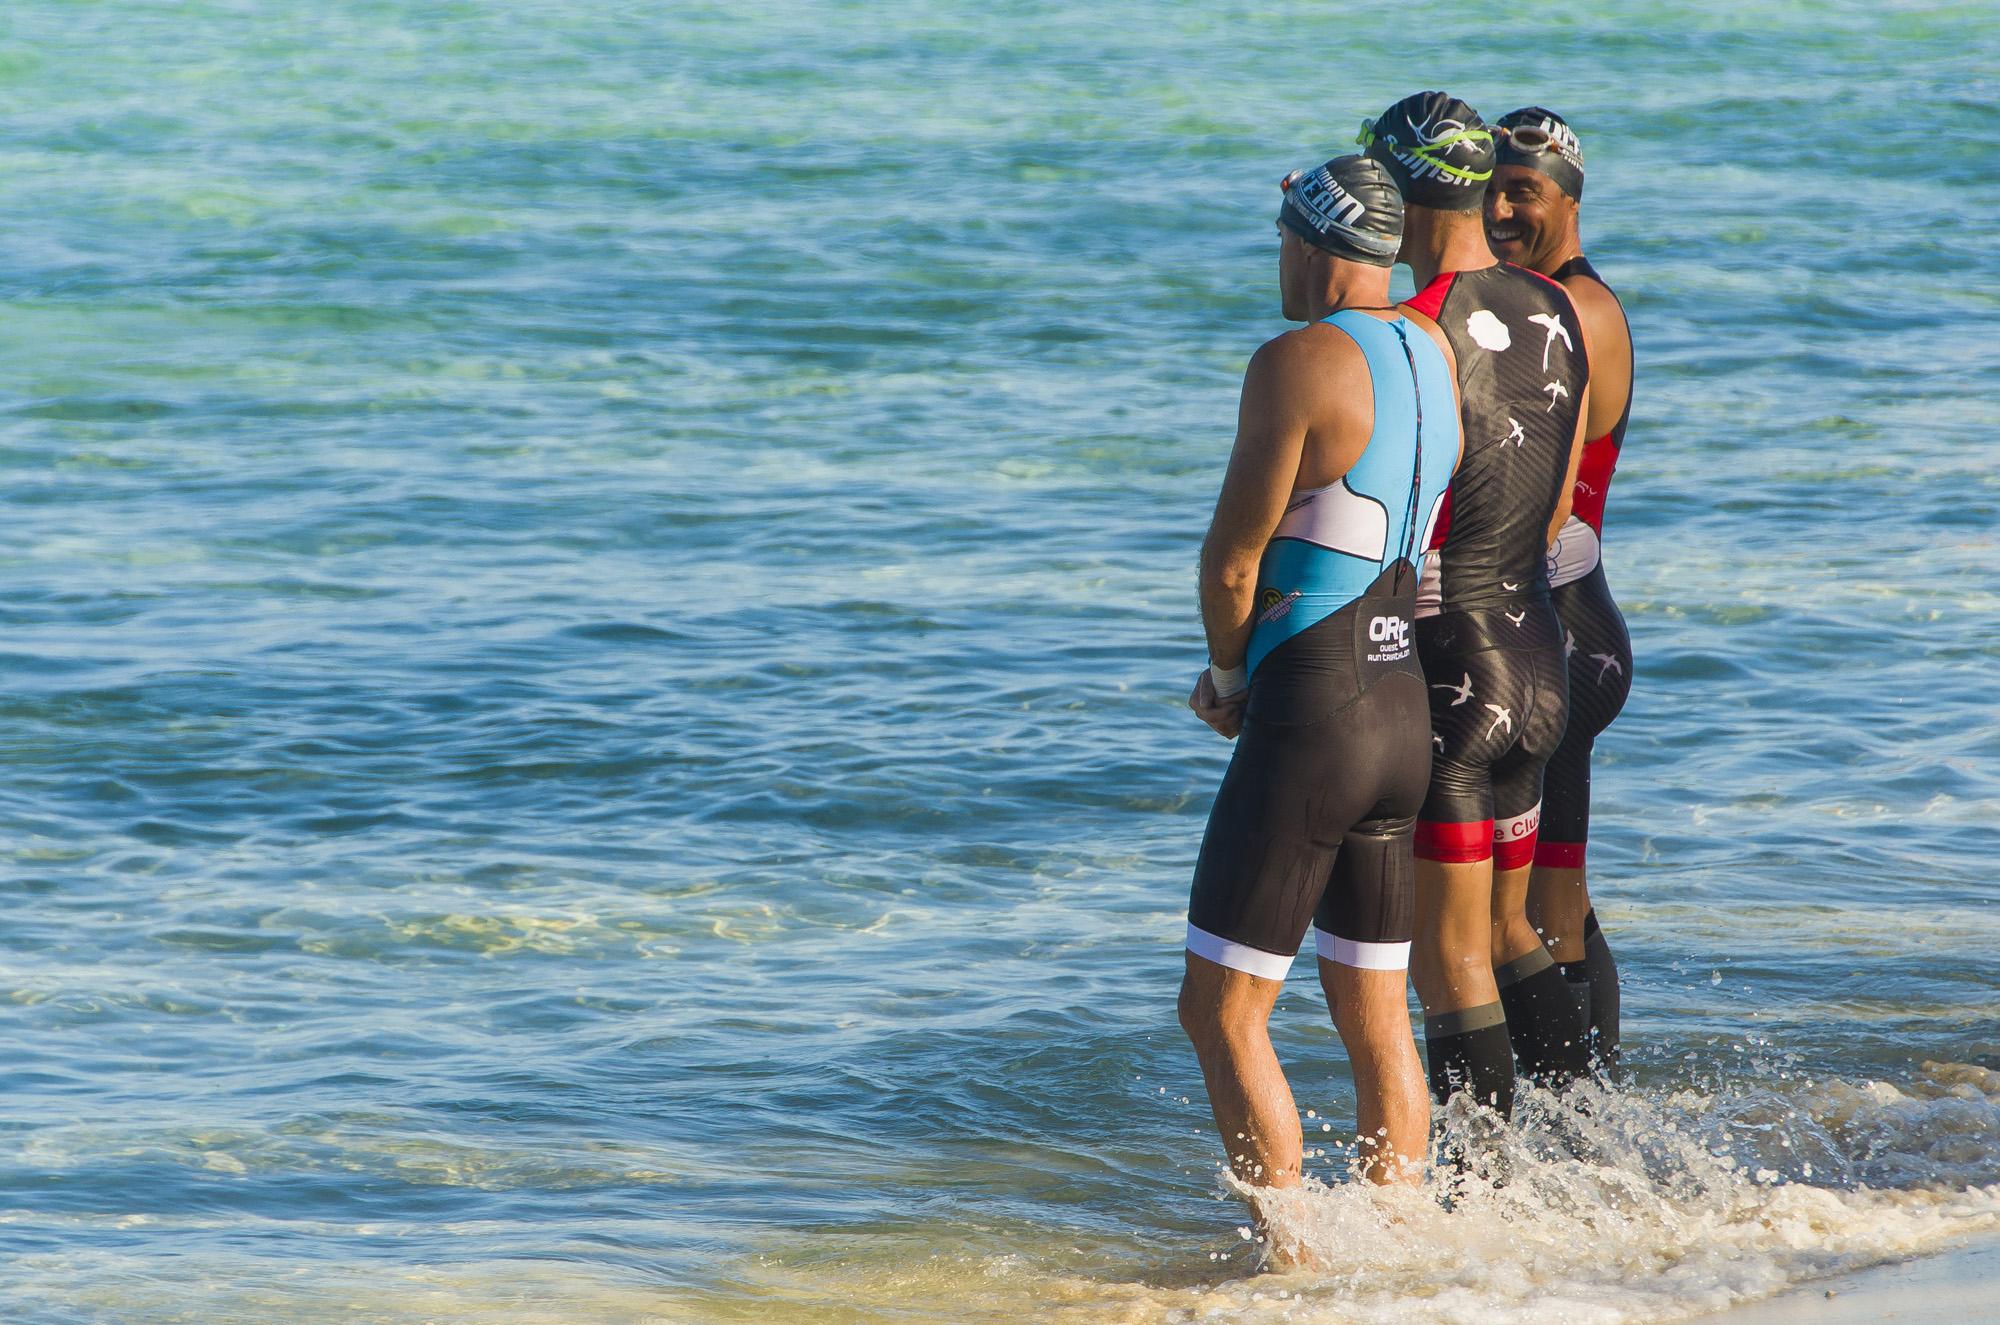 Indian Ocean Triathlon 2016-32_1.jpg